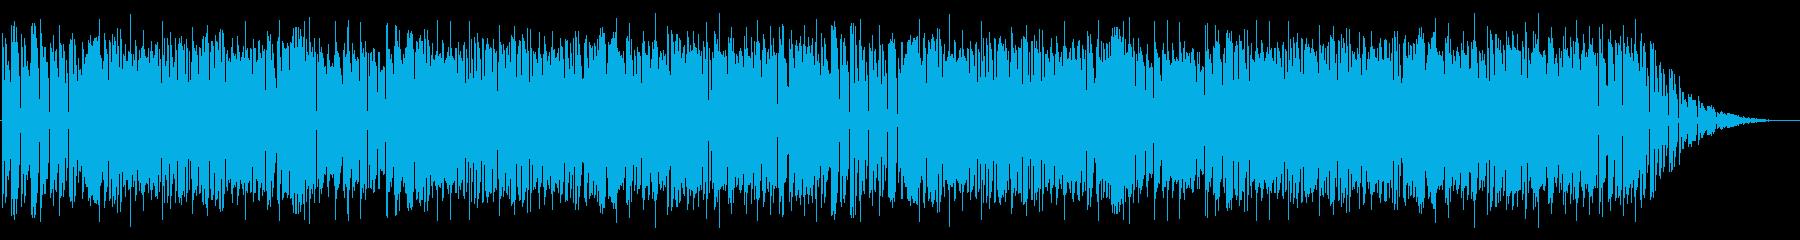 NES アクションC03-1(ステージ1の再生済みの波形